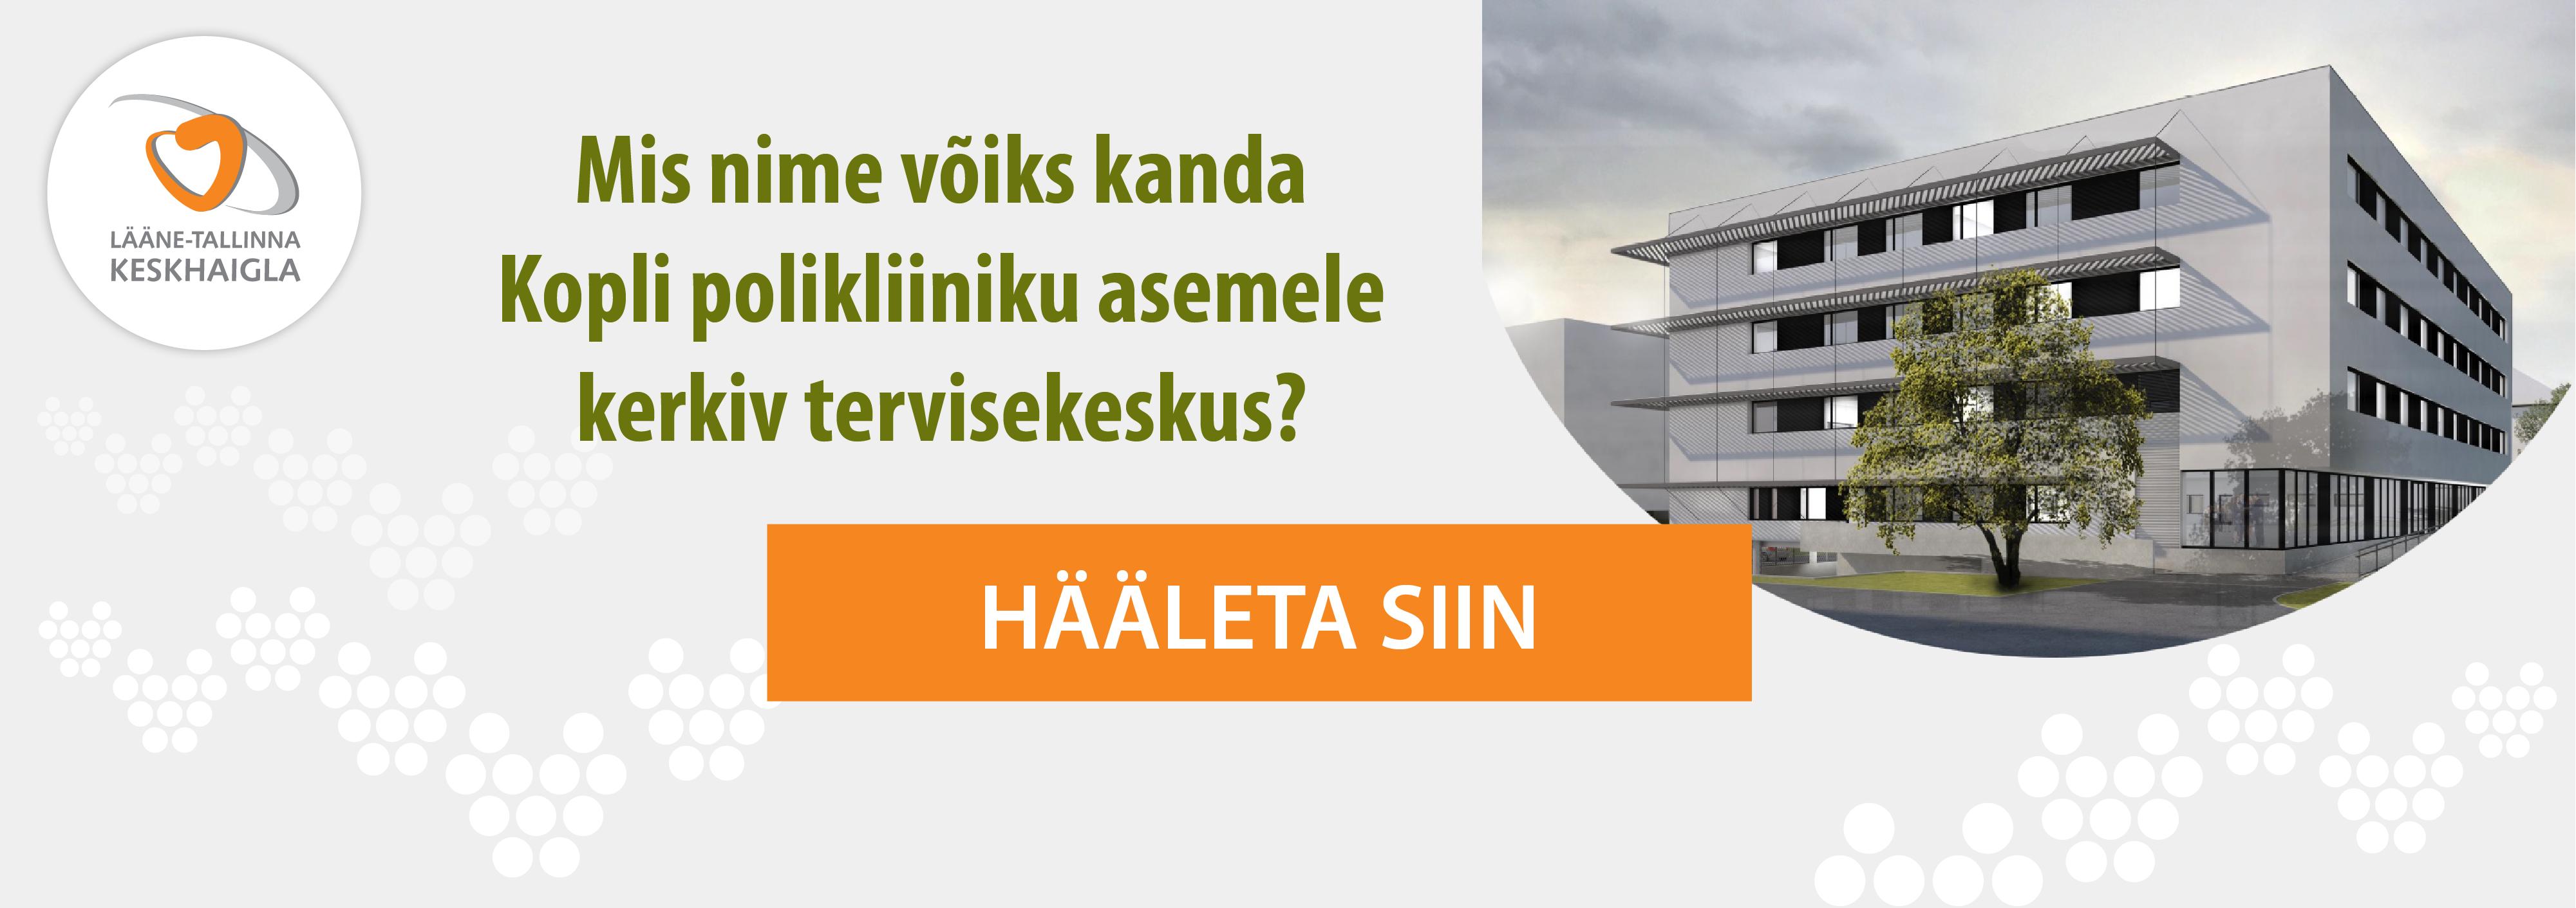 slider_kopli-nimi2-1